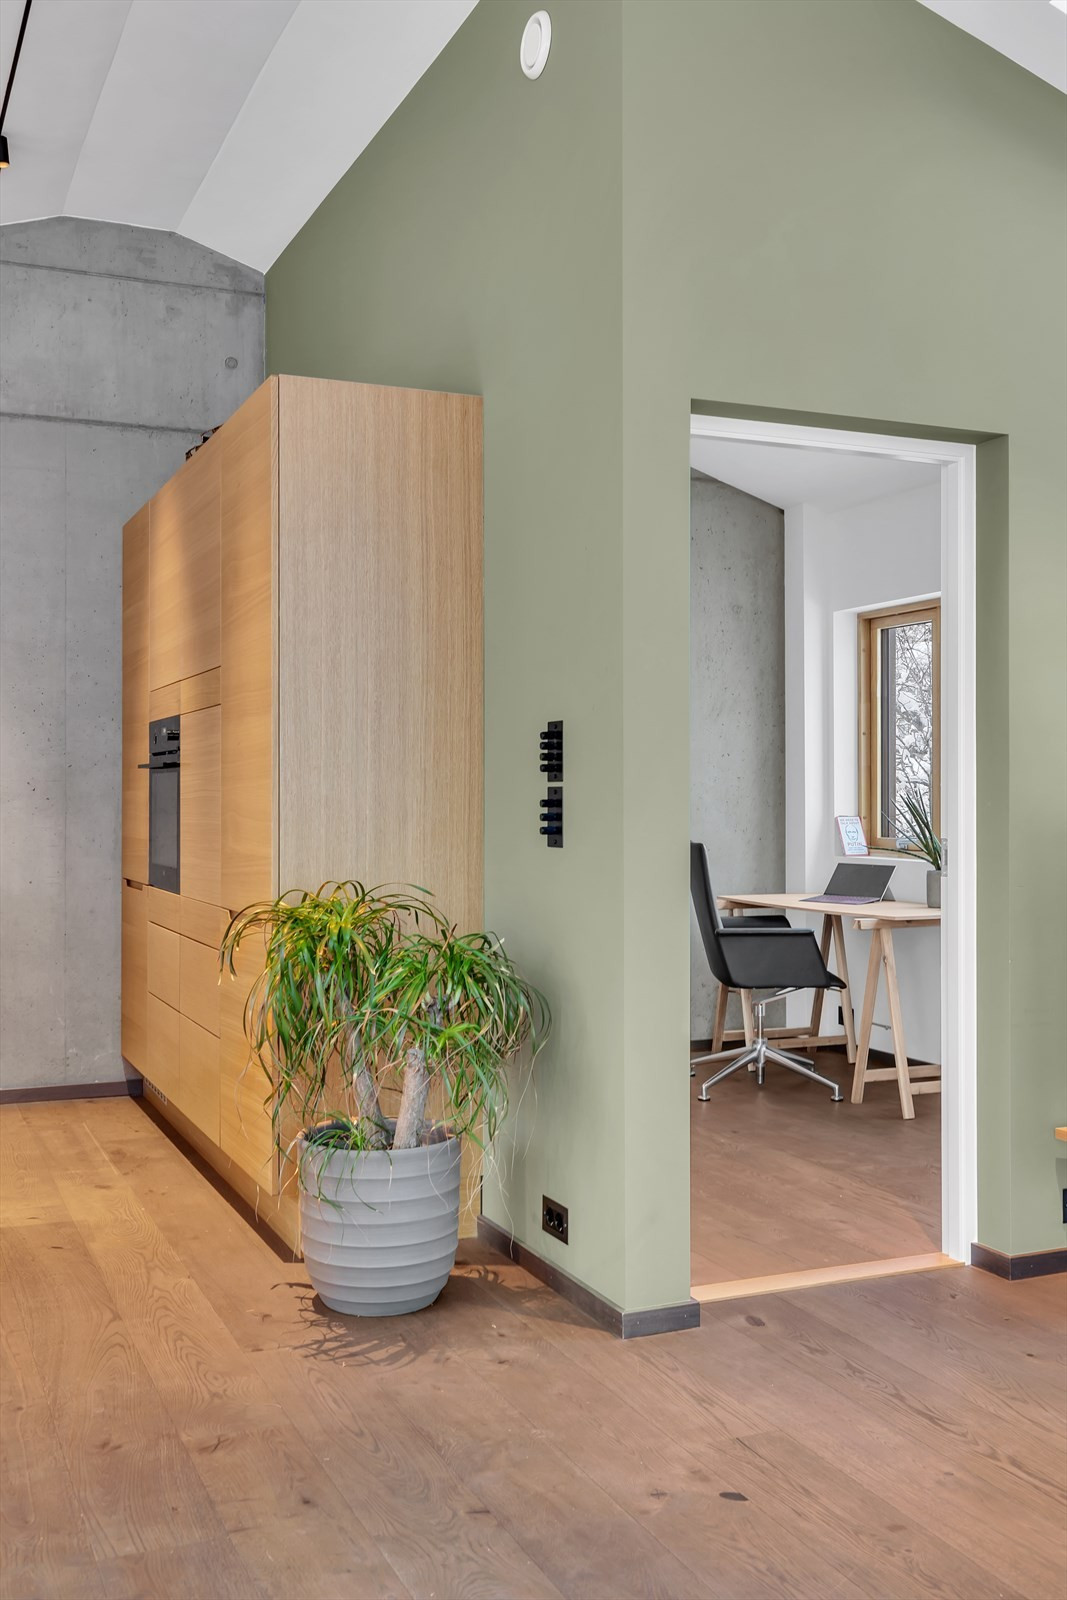 Inngang til kontor/tv-stue/soverom.